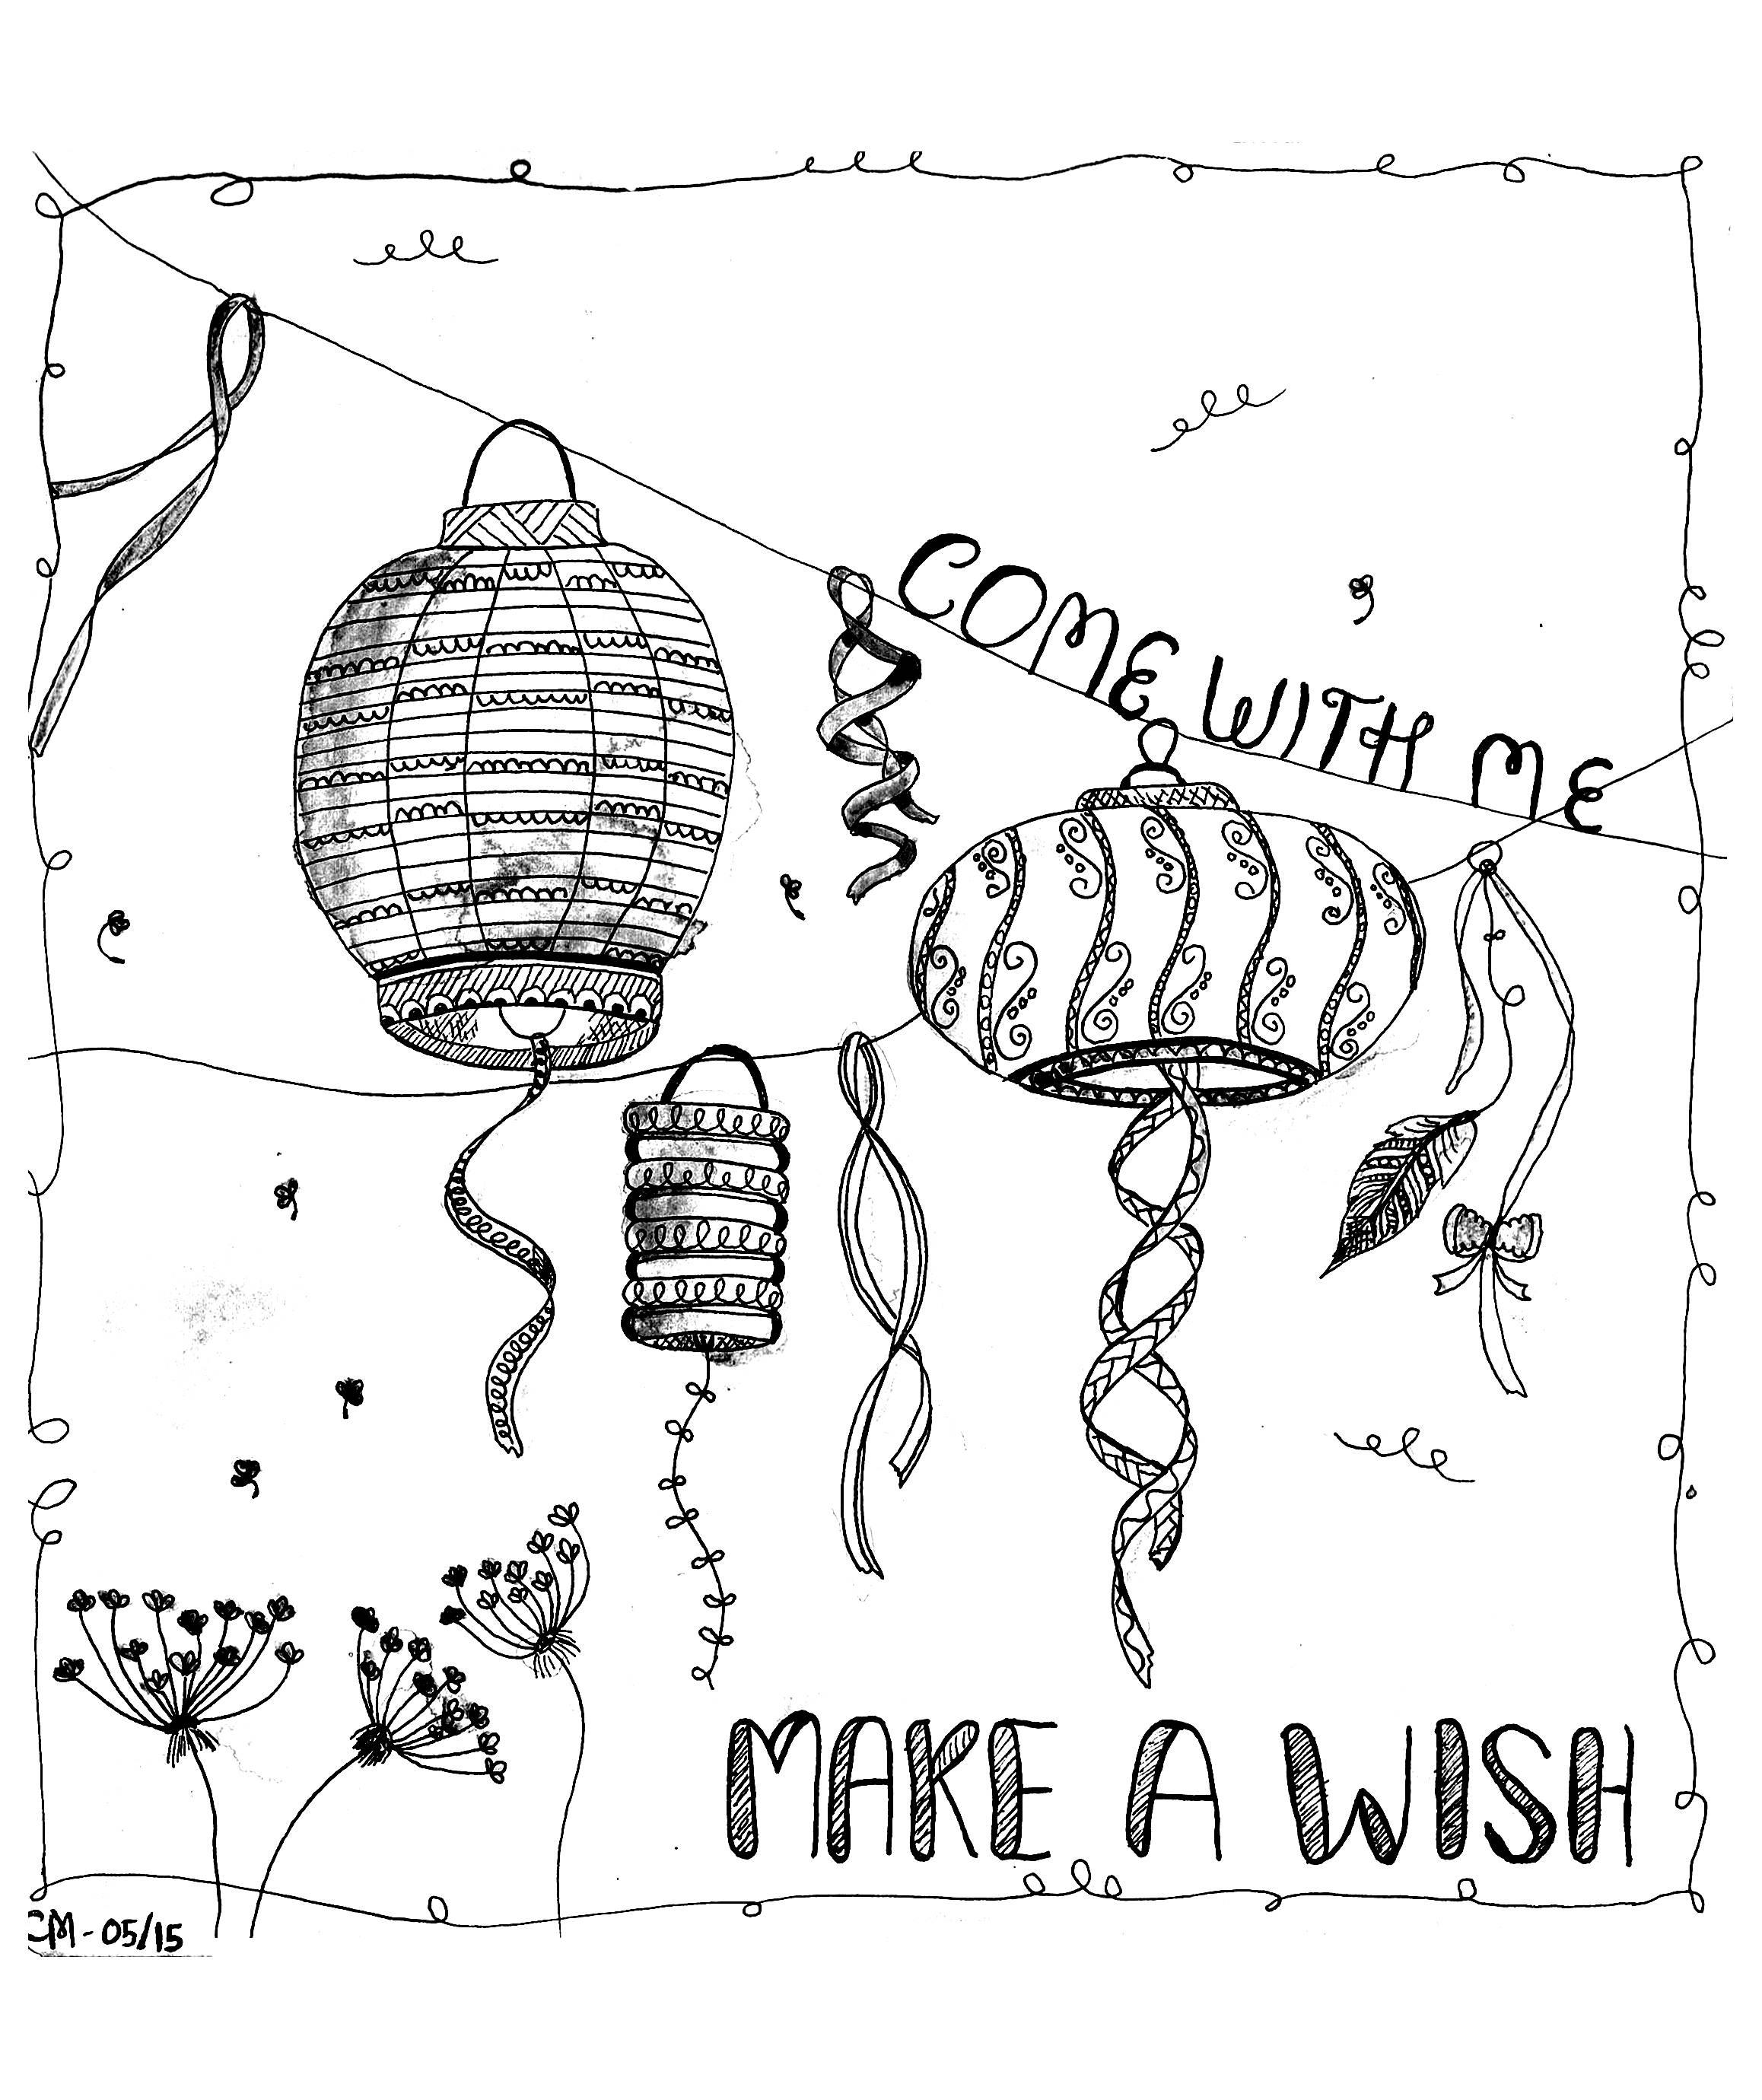 'Fais un vœu', coloriage original style Zentangle  Voir l'oeuvre originale